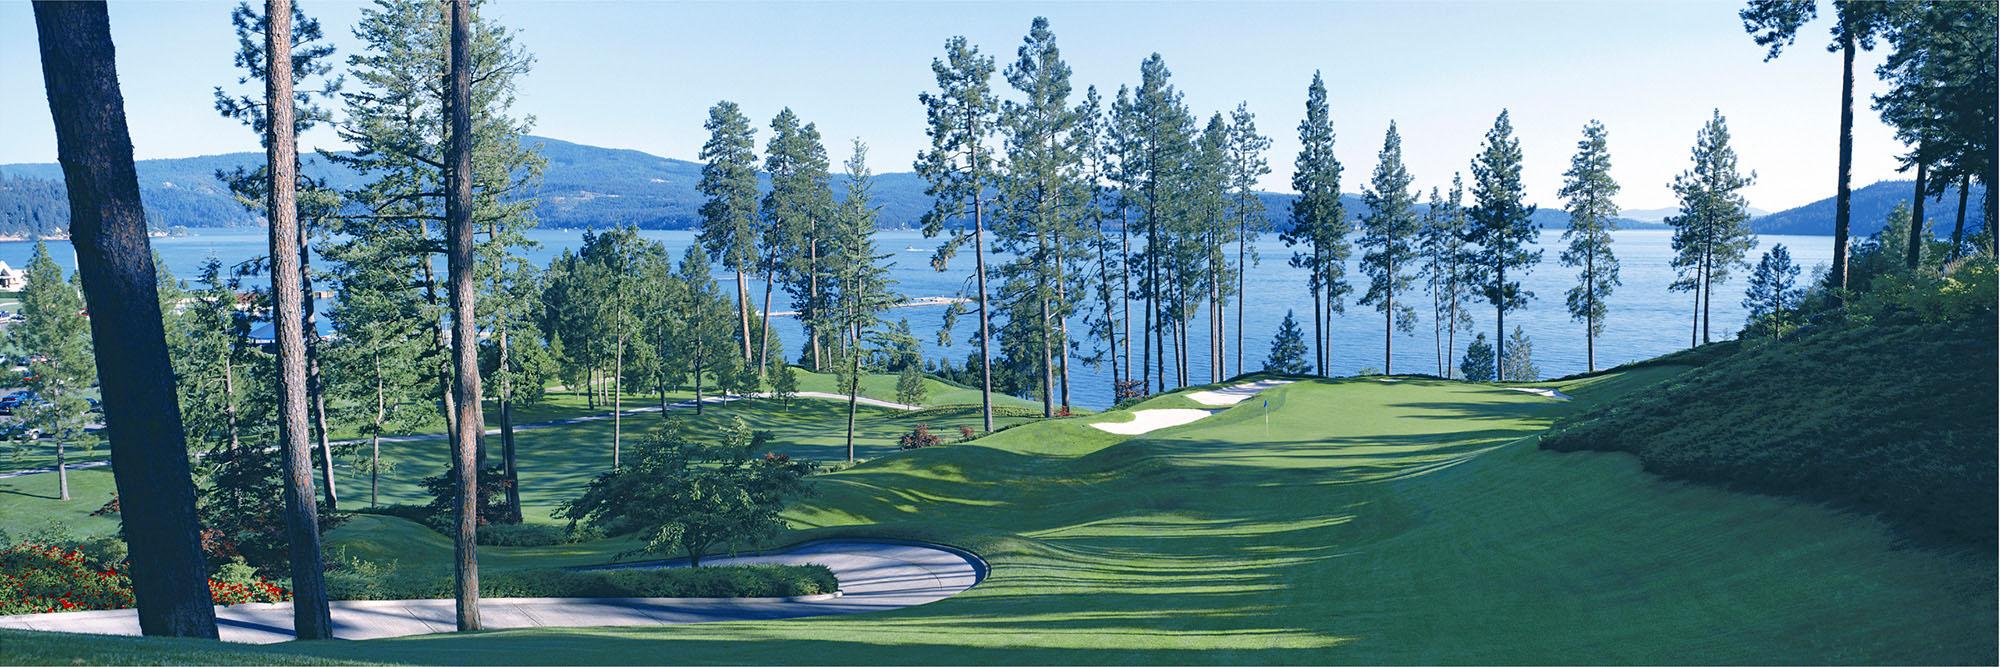 Golf Course Image - Coeur D' Alene No. 6